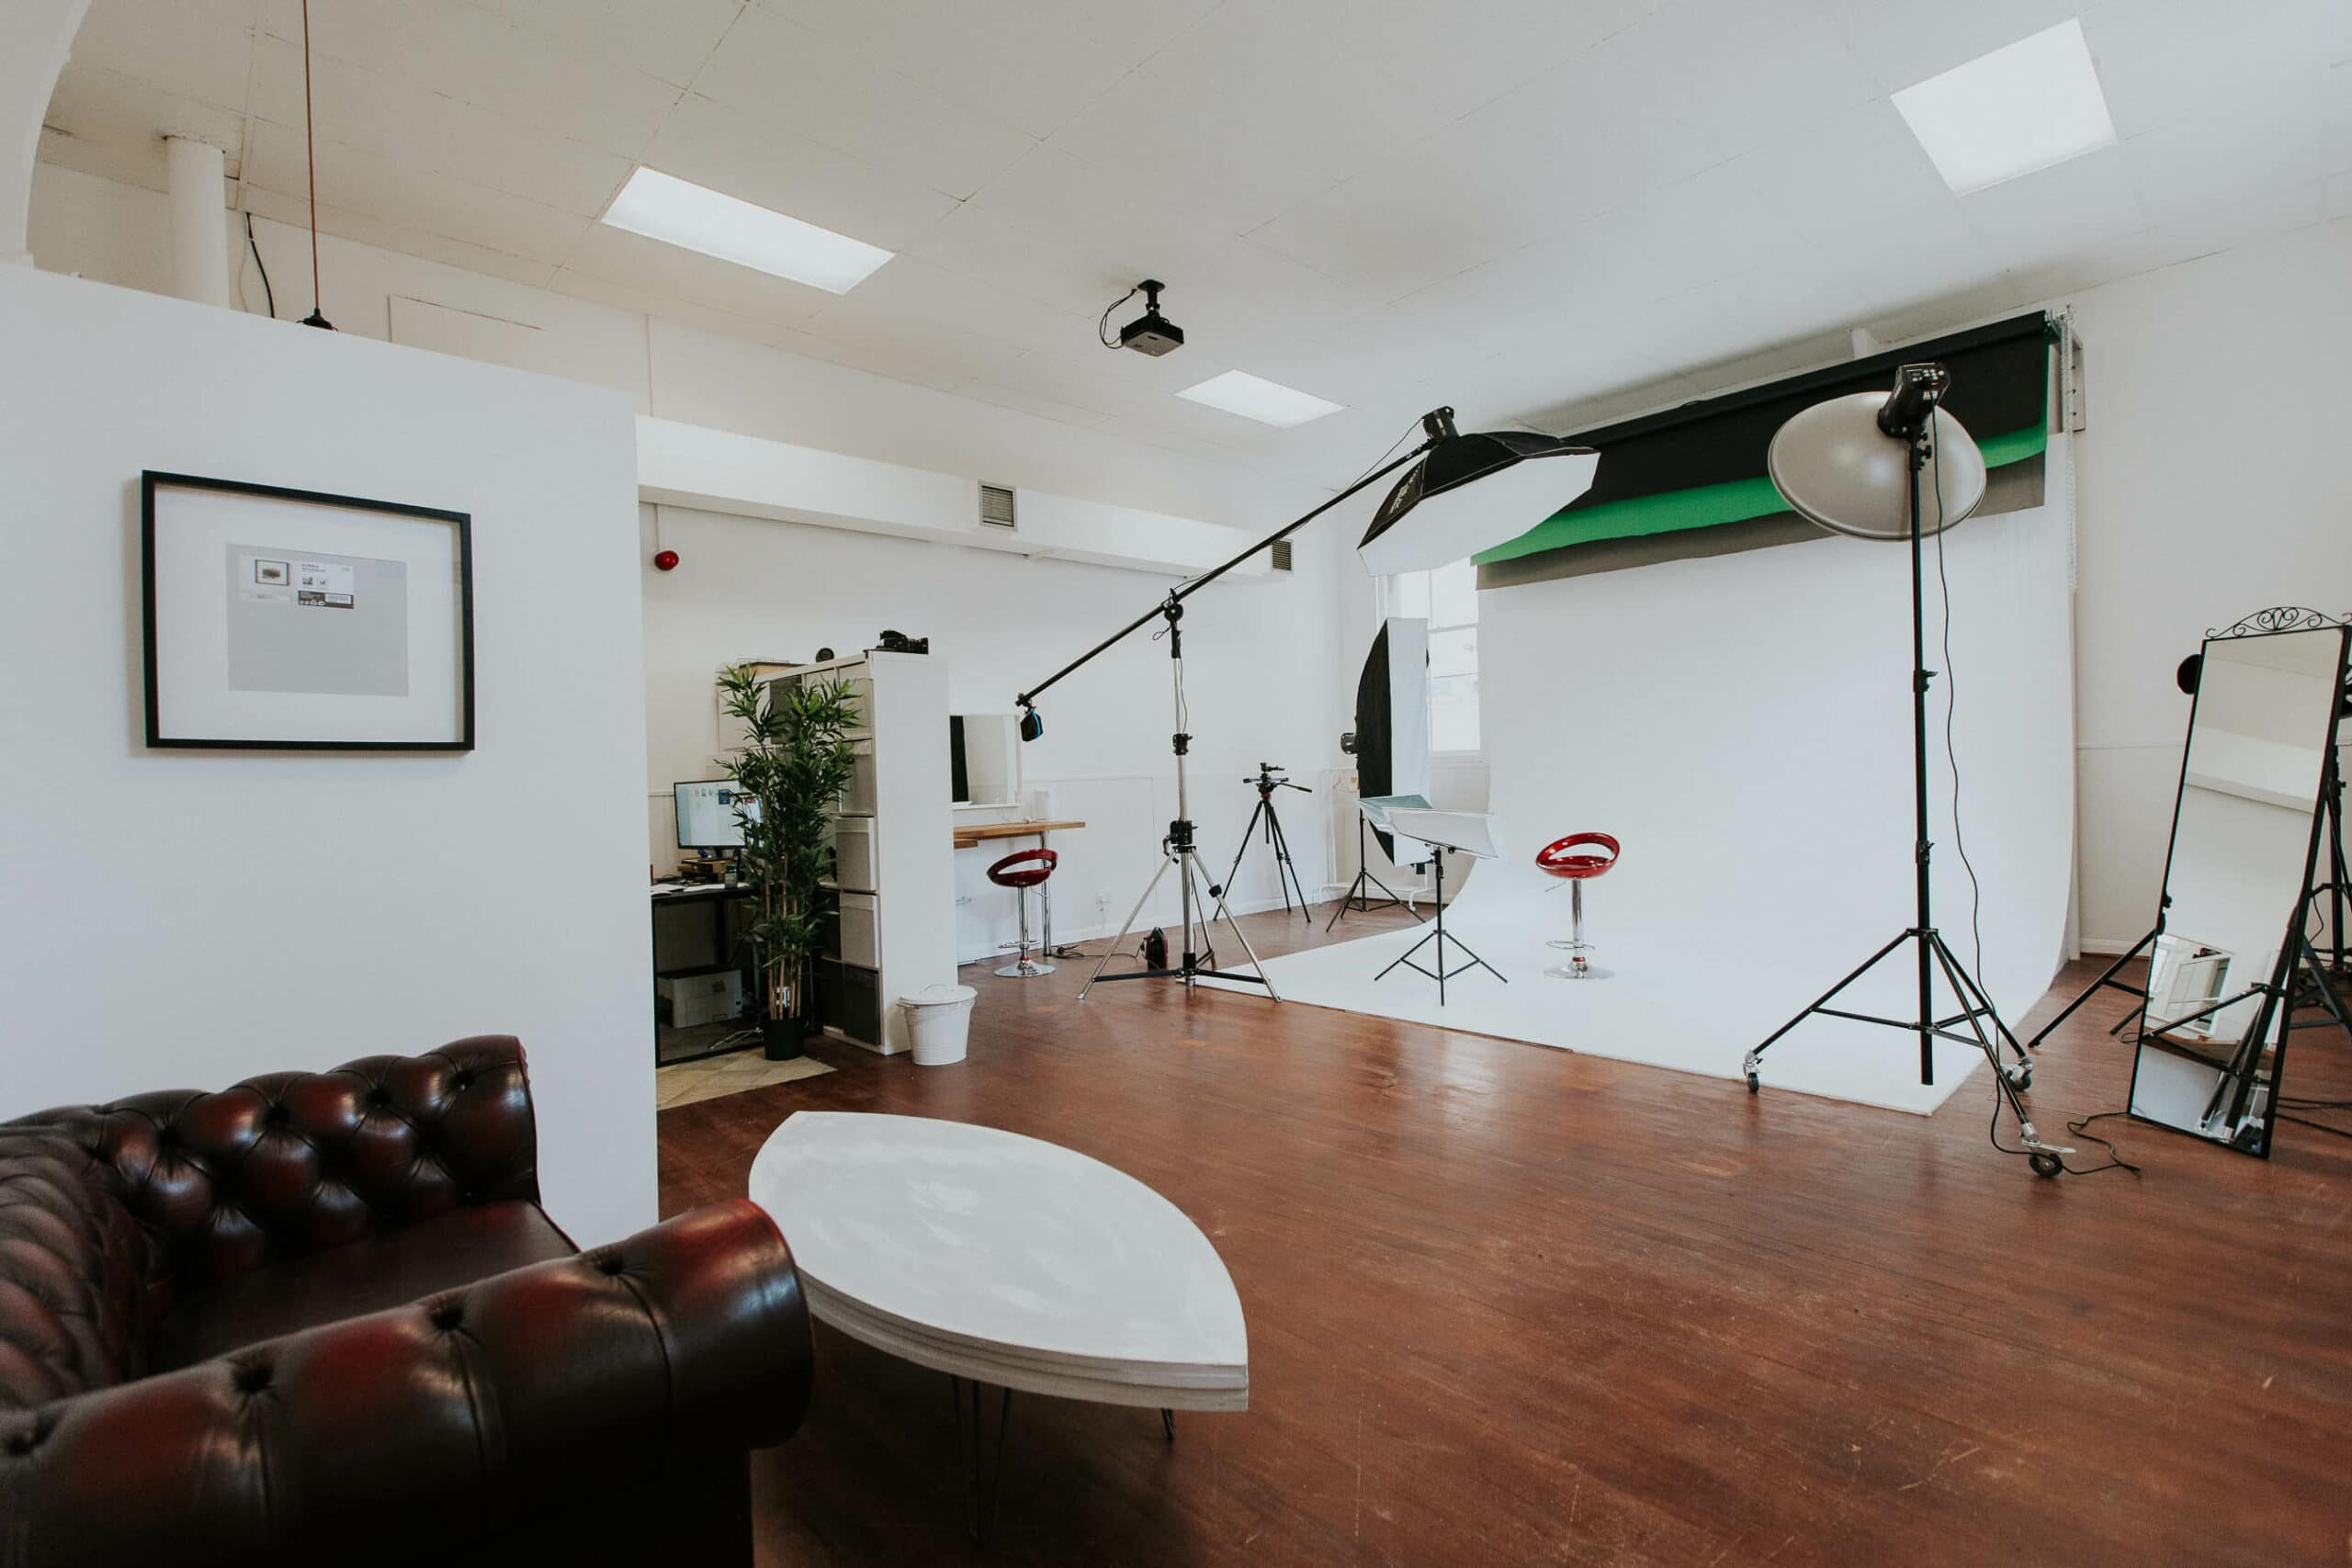 studio atelier hire space oxford photographers creative lights